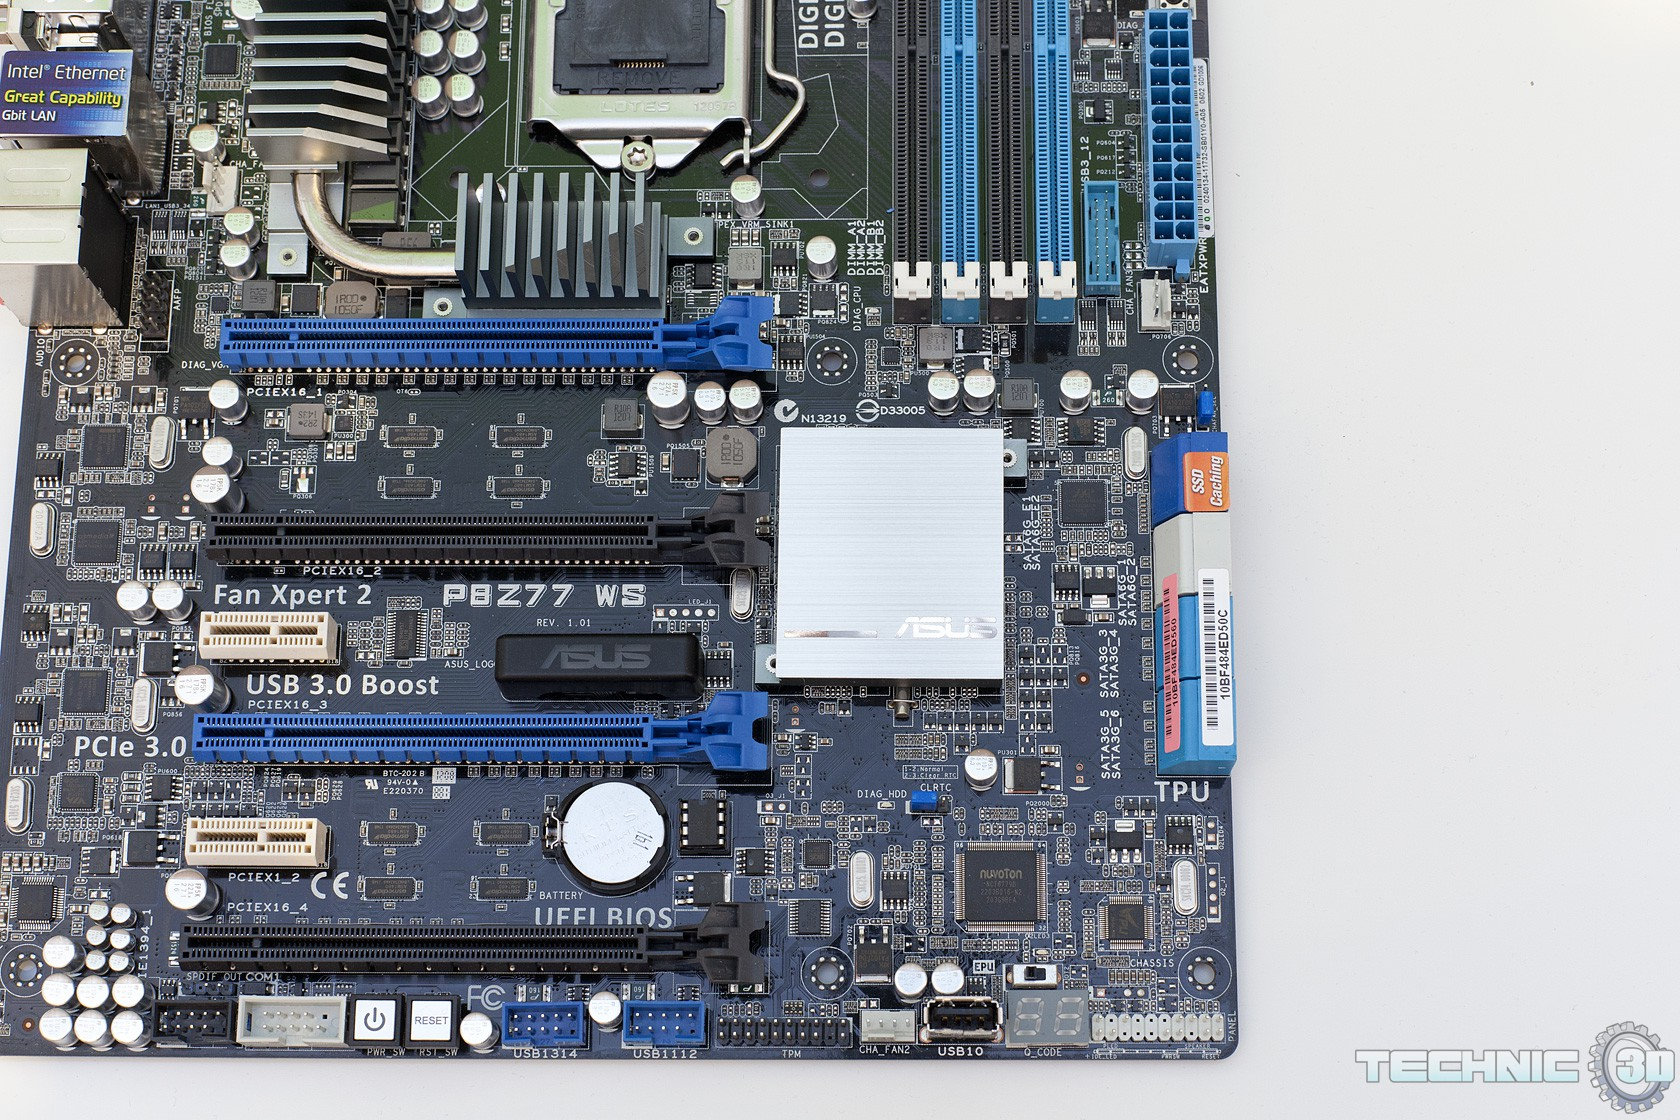 Asus P8Z77 WS ASMedia USB 3.0 Drivers (2019)